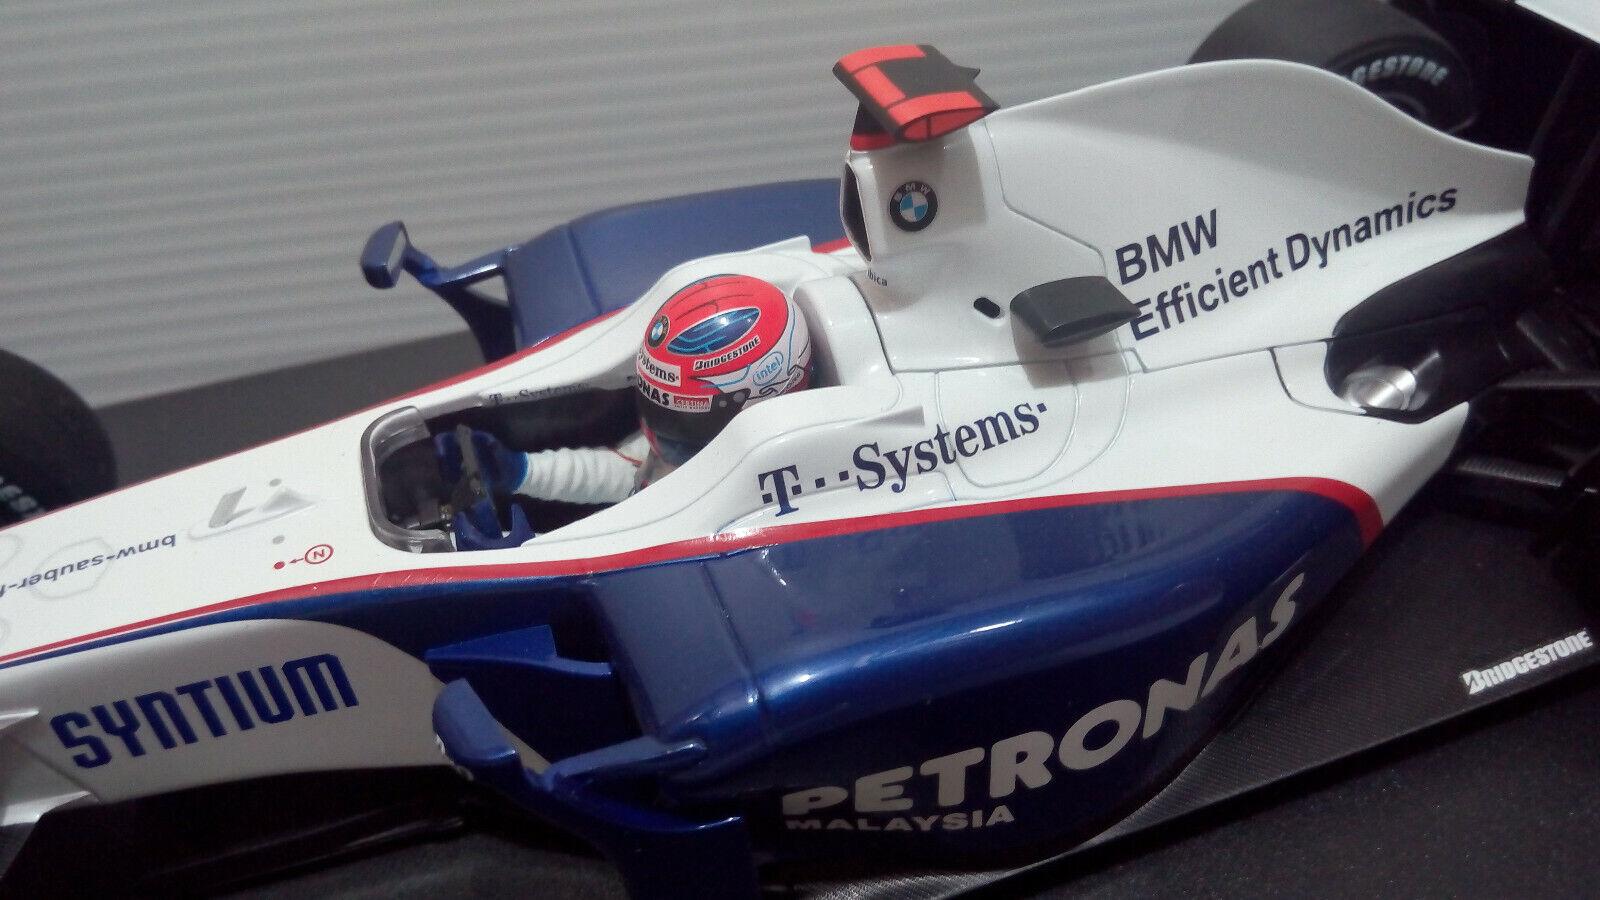 1 18 Sauber BMW F1.09 09 2009  AUSTRALIAN GP Robert Kubica - MINICHAMPS  bon shopping